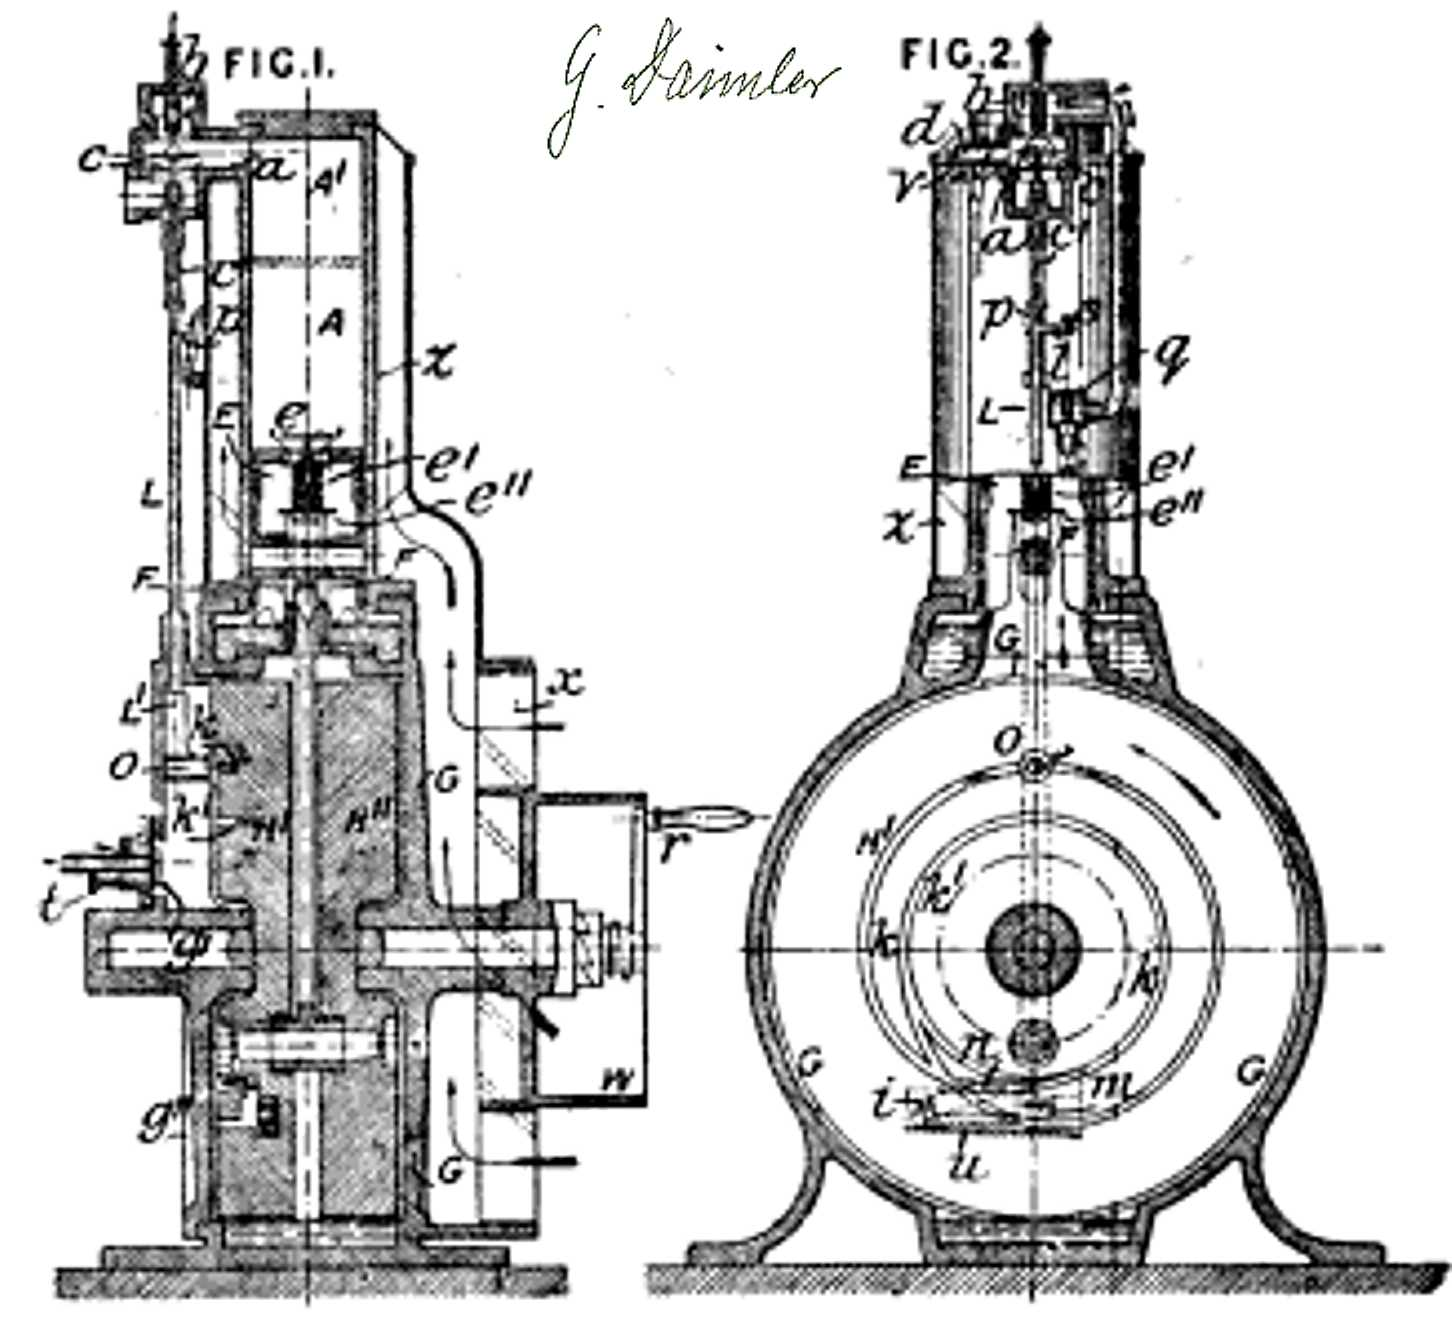 Gottlieb Wilhelm Daimler Gottlieb Wilhelm Daimler